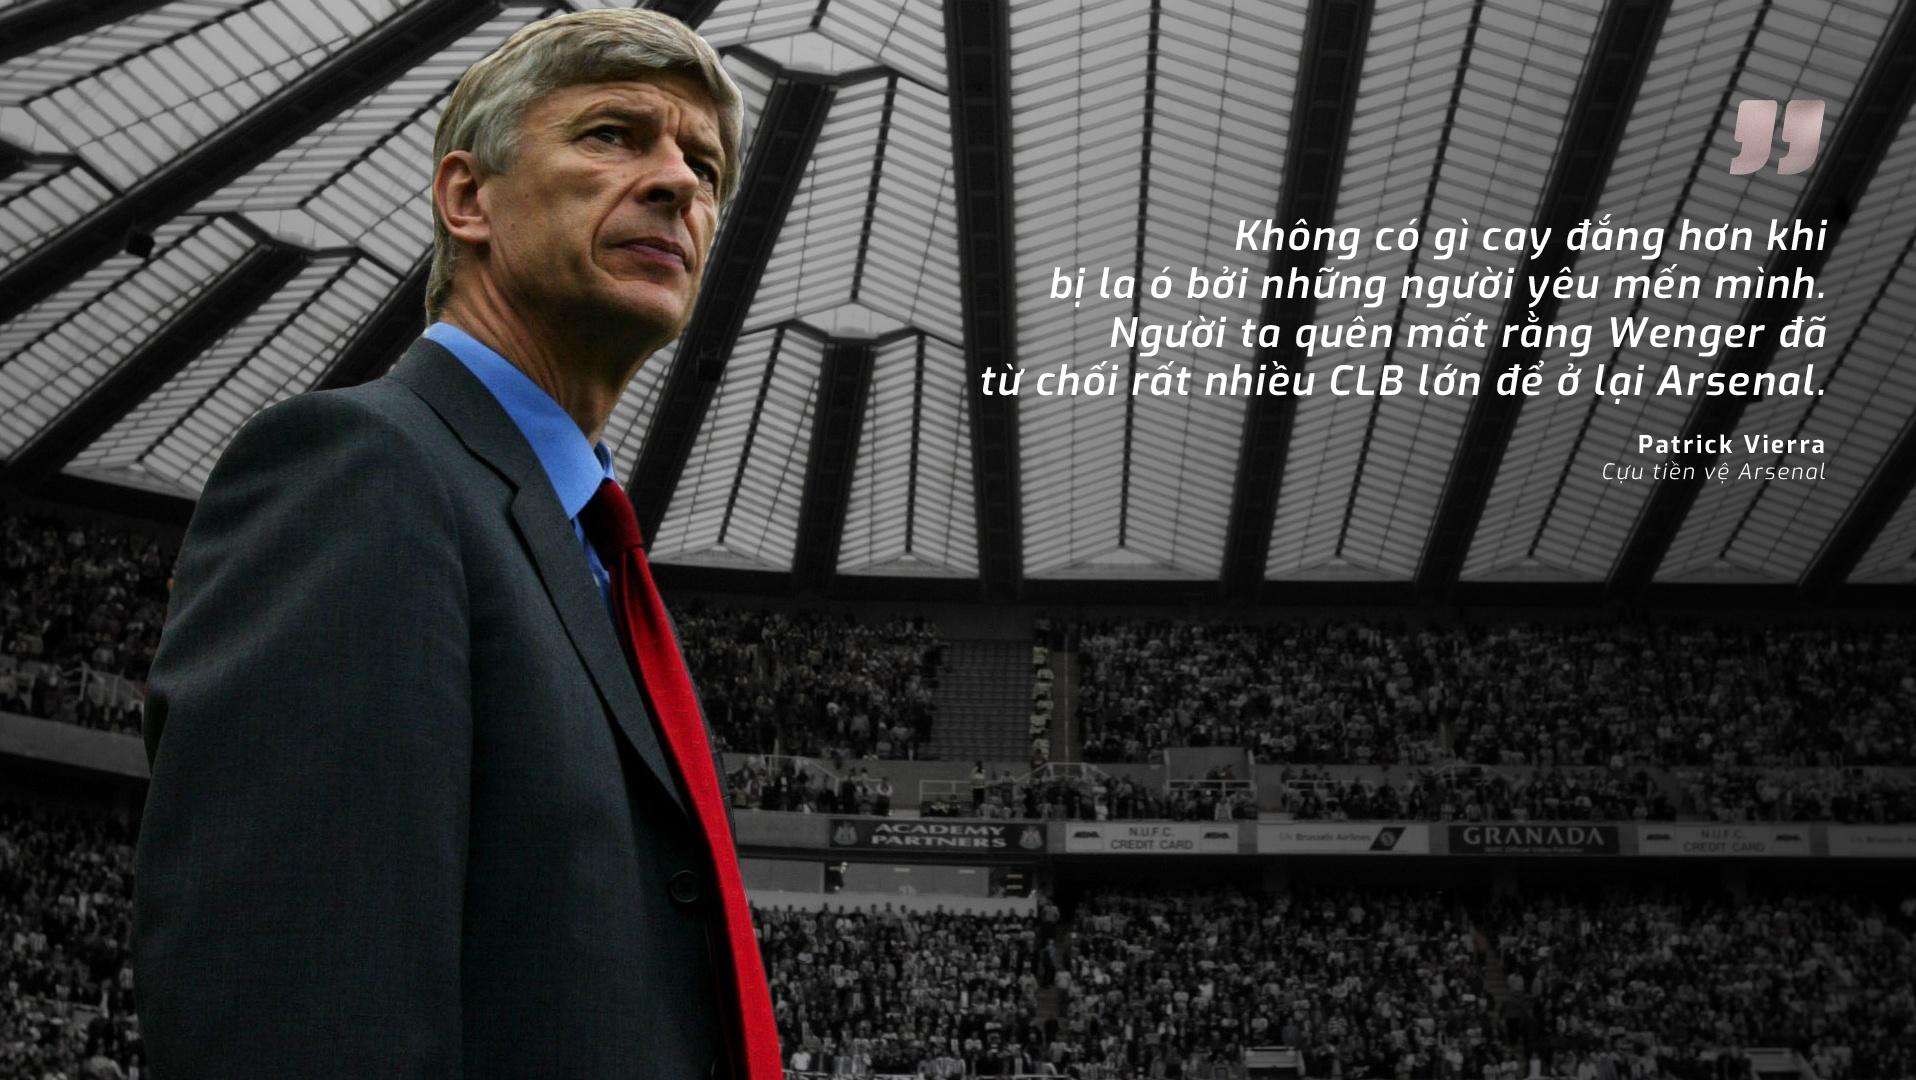 Wenger va Arsenal: Den vi dinh menh, gan bo vi tinh yeu hinh anh 7